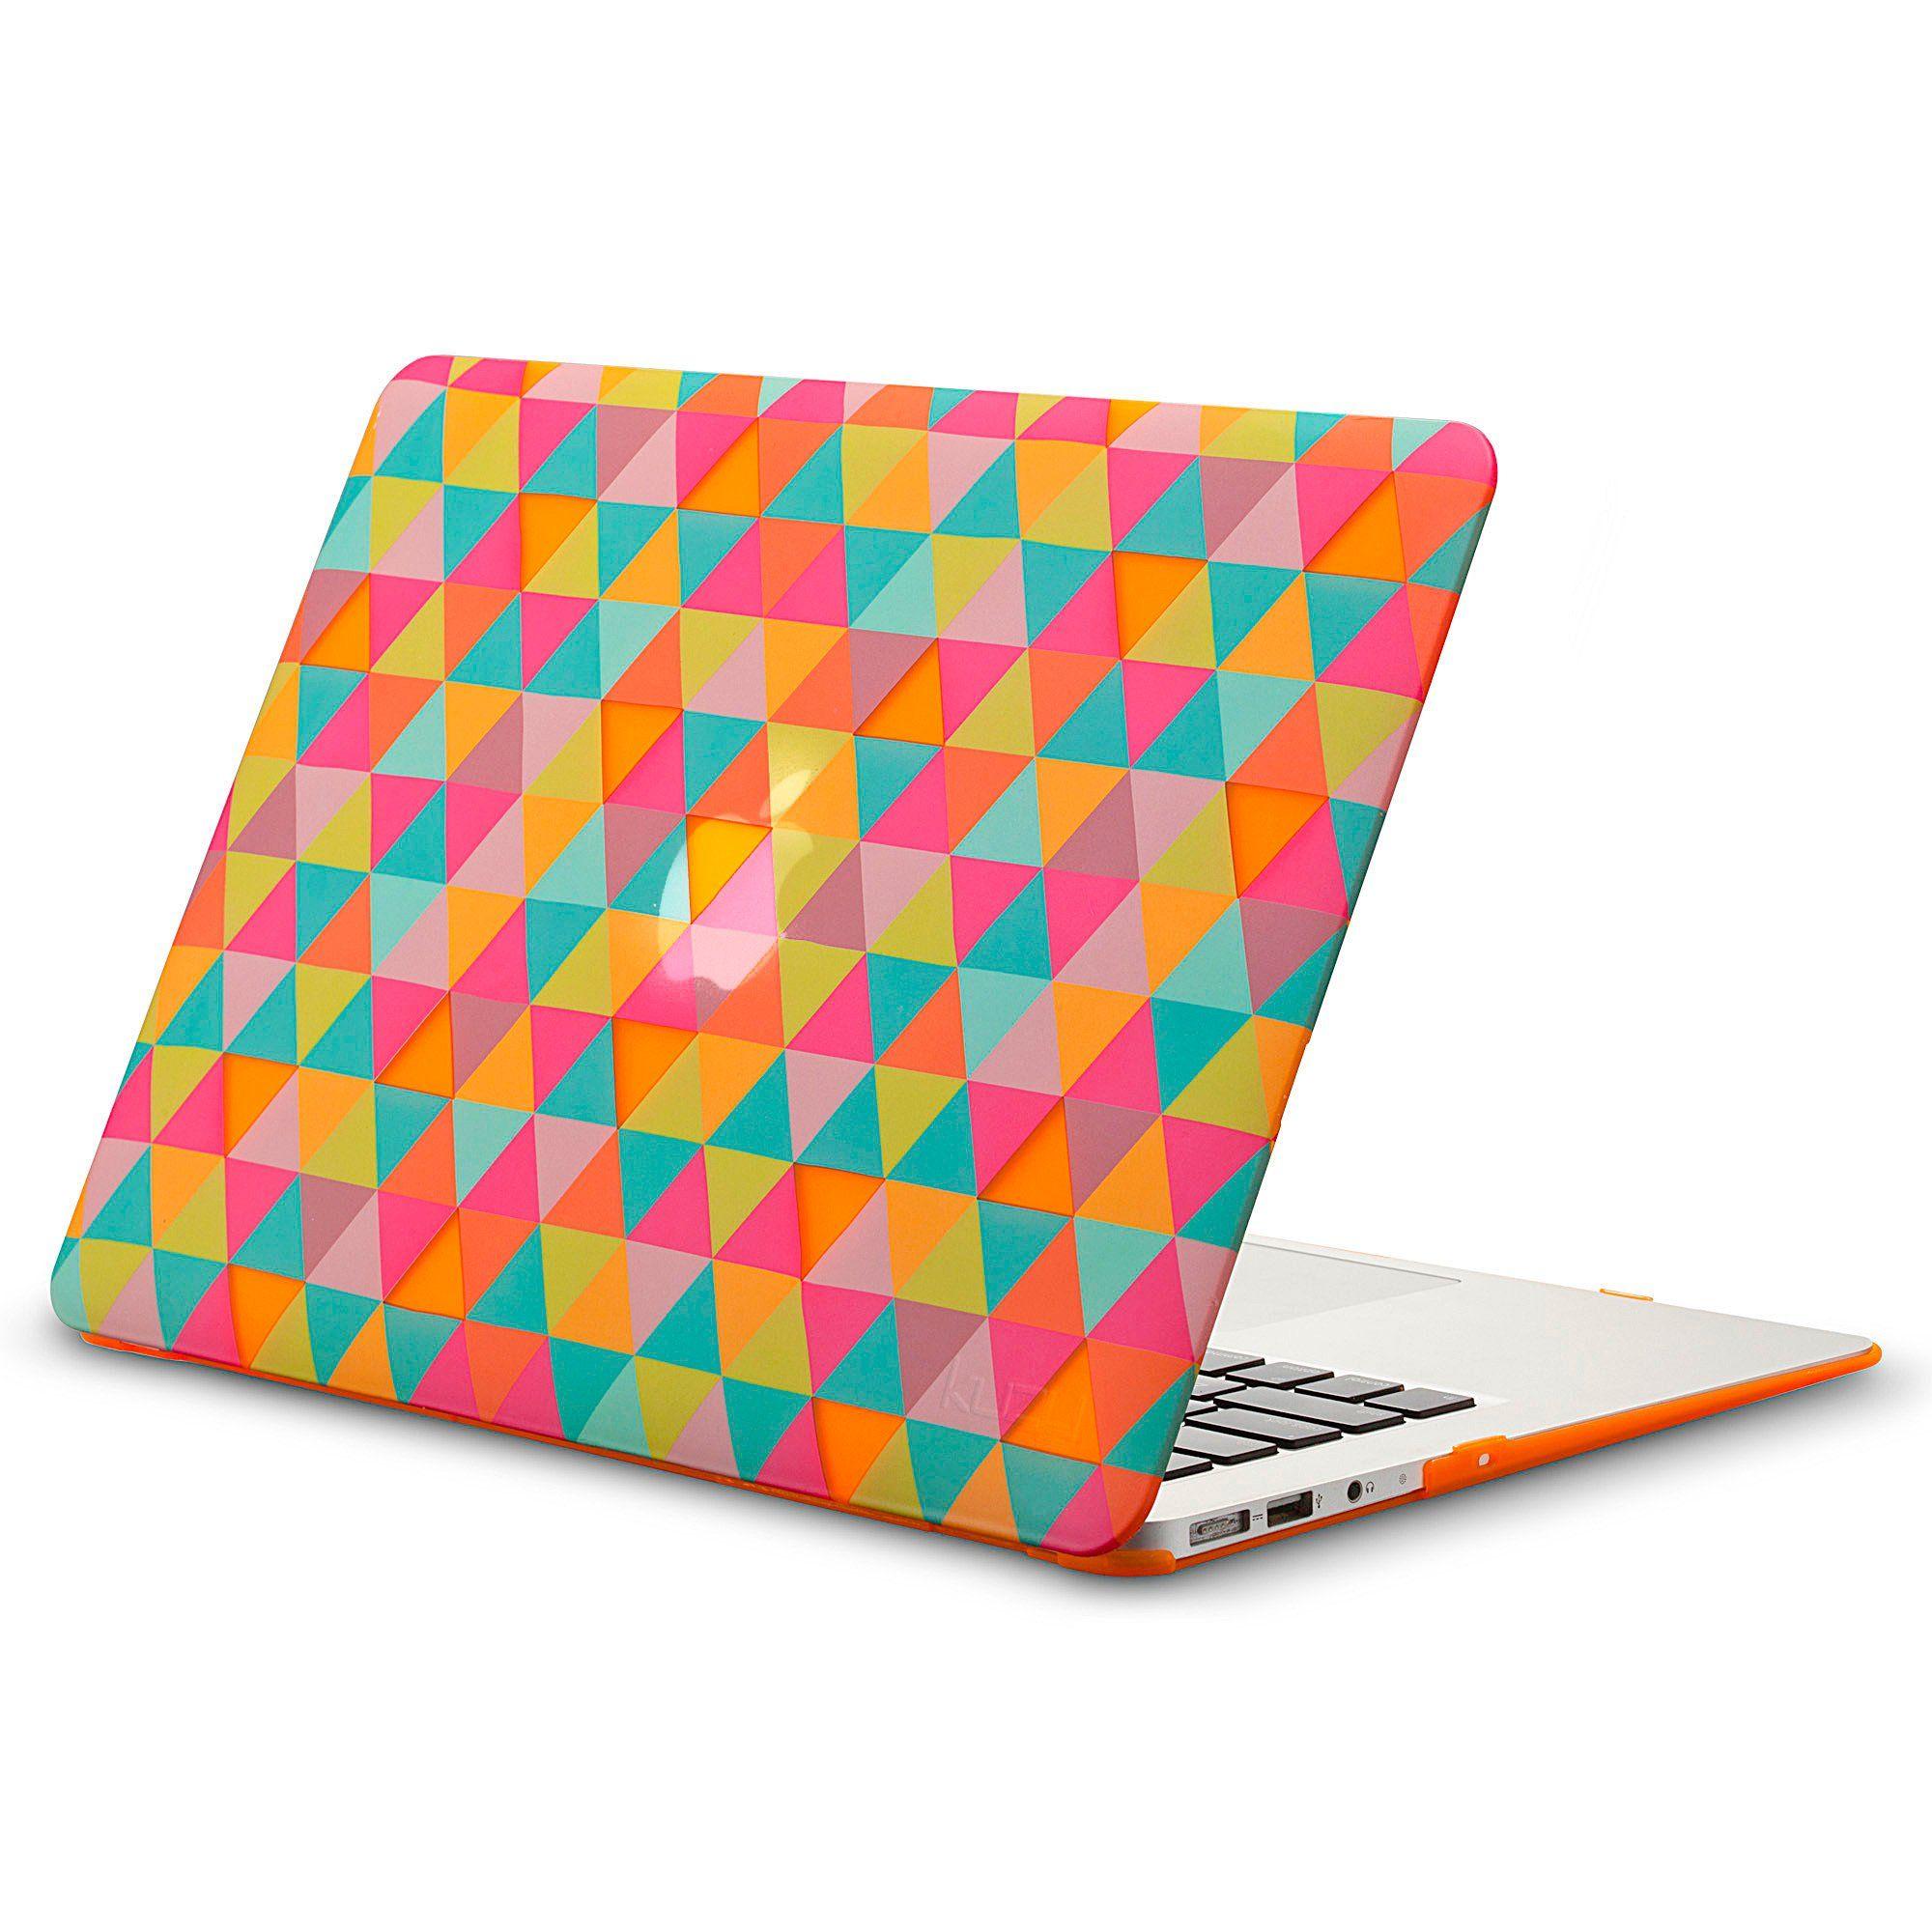 buy popular 81e32 eeeb6 Kuzy - AIR 13-inch Triangles ORANGE Rubberized Hard Case for MacBook ...